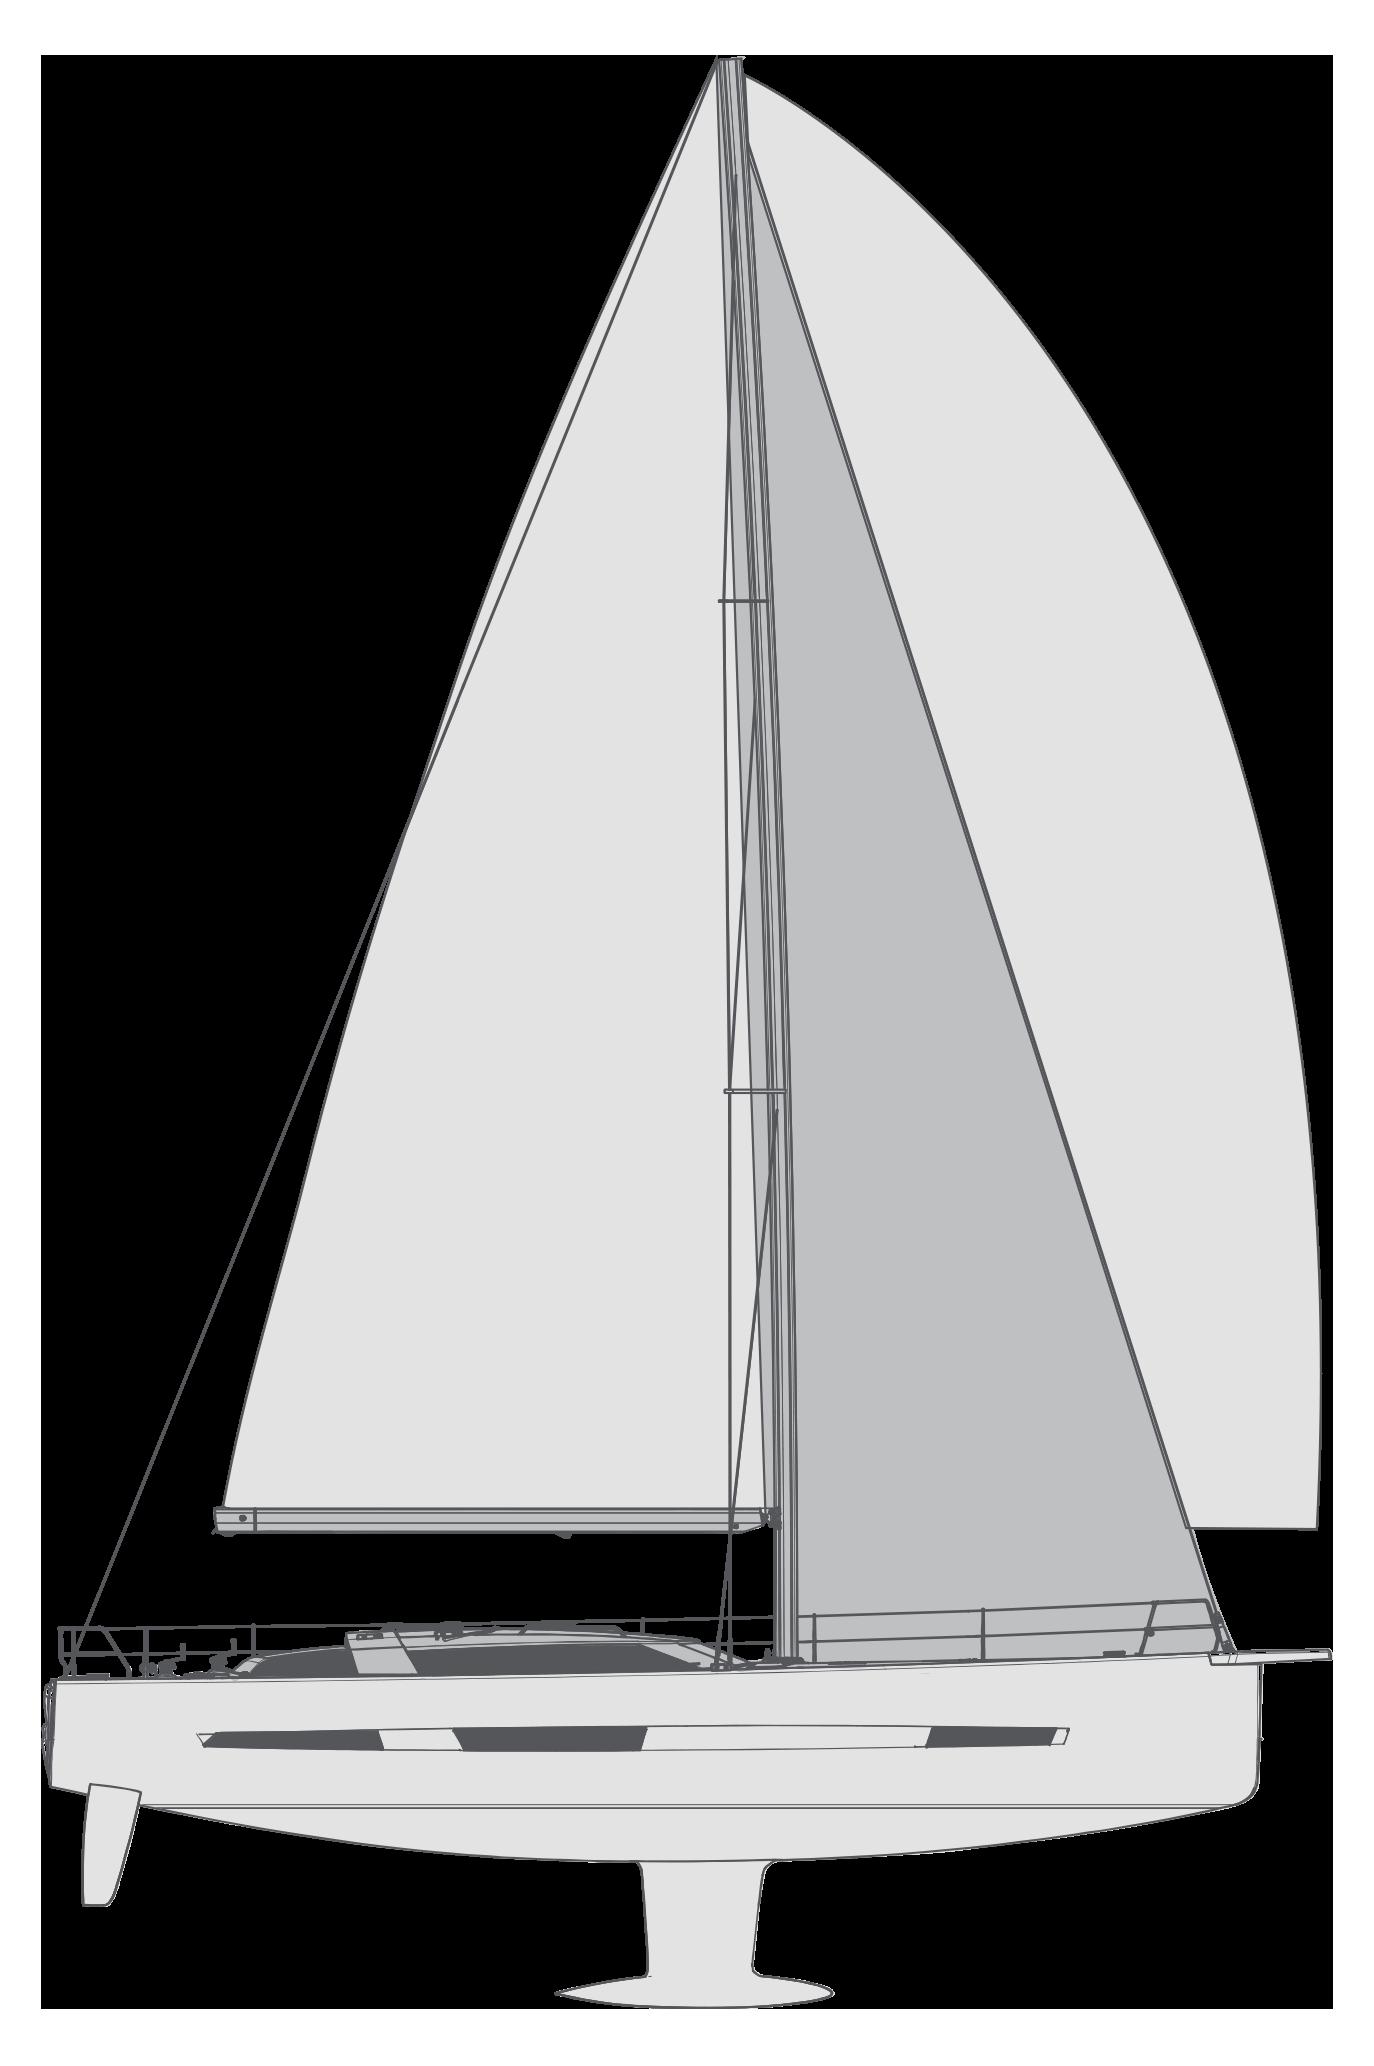 Impression 40.1 Elan sailing yacht